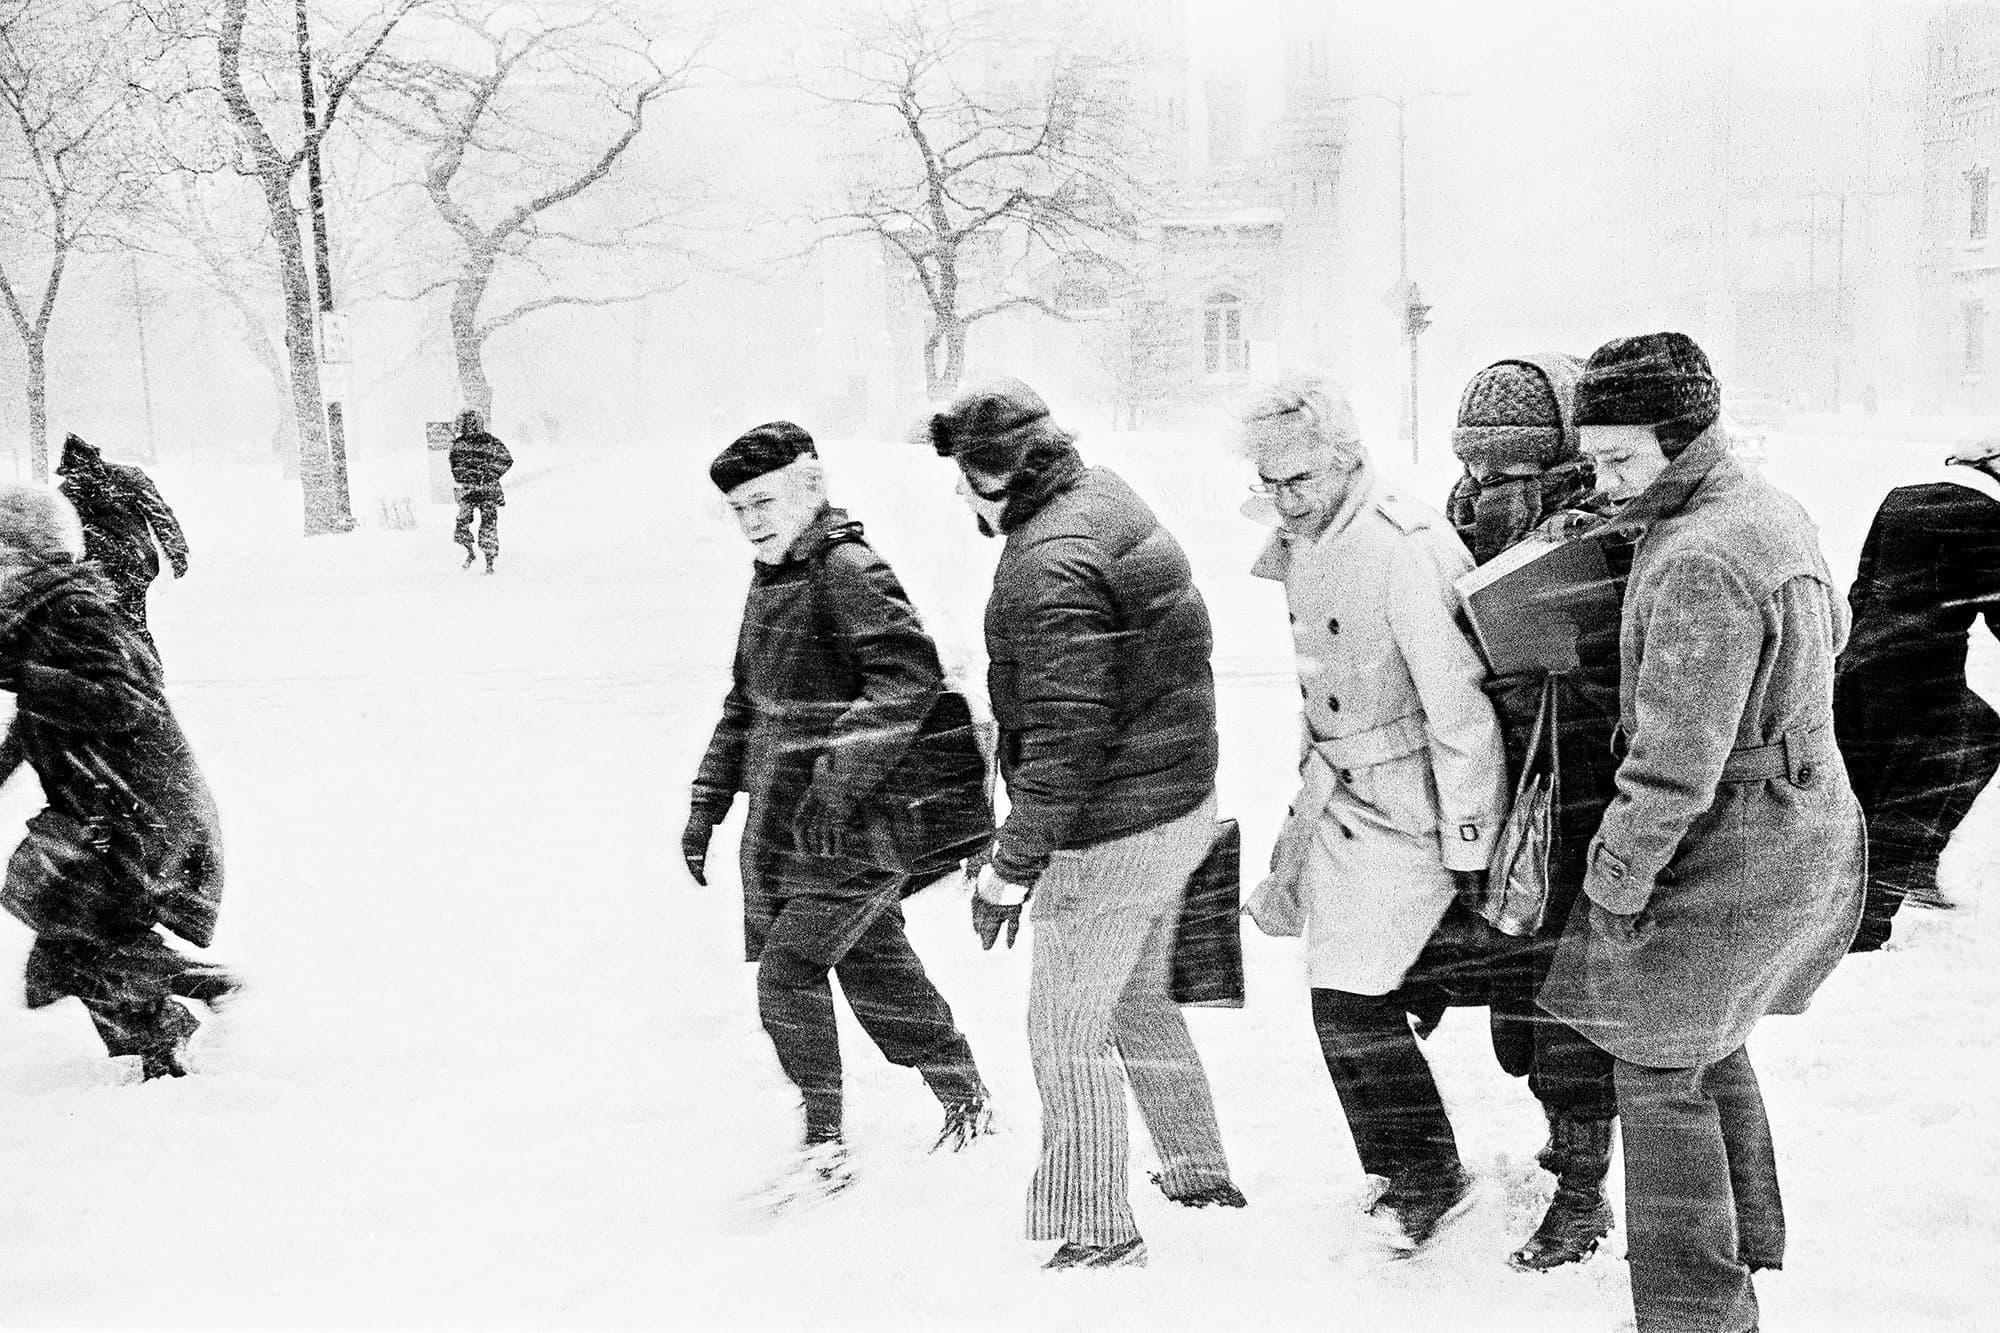 Snowstorm-1978 arthur lazar